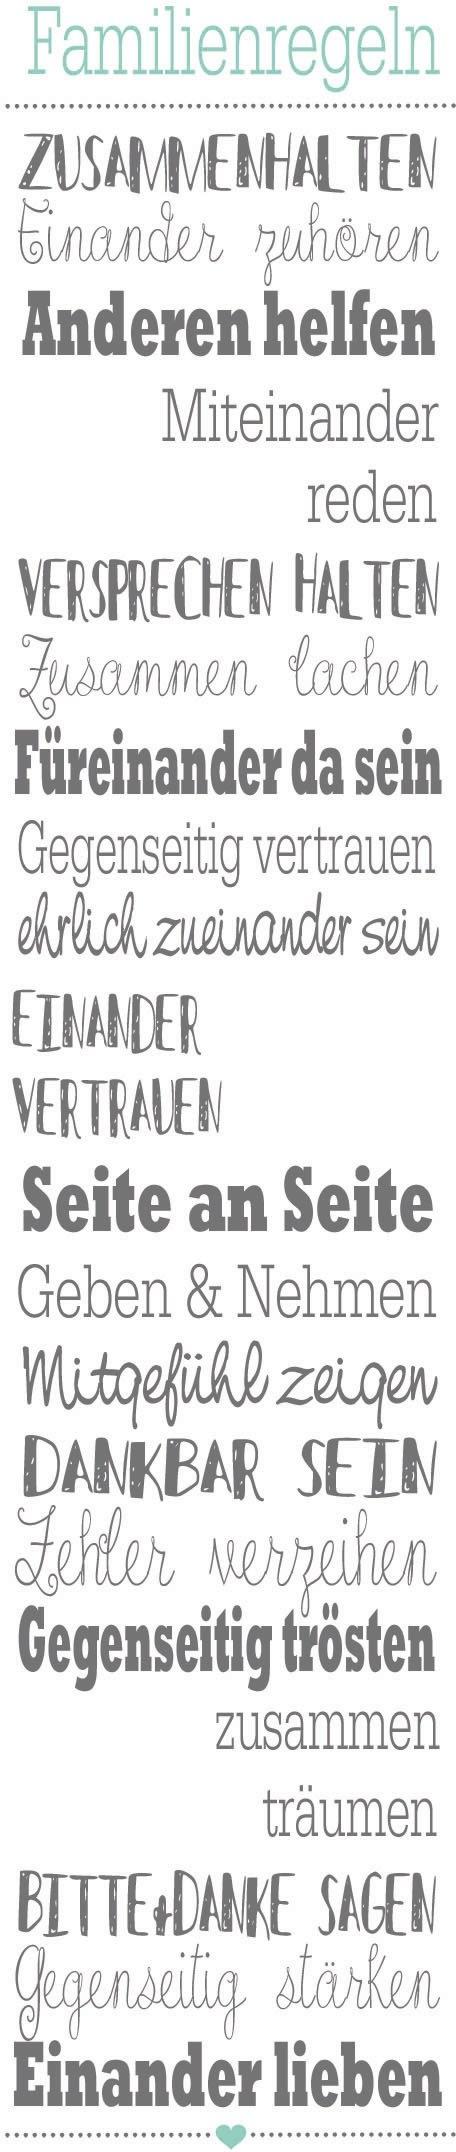 Bönninghoff artprint op linnen Spieraam ca.25x120 cm (1 stuk) veilig op otto.nl kopen